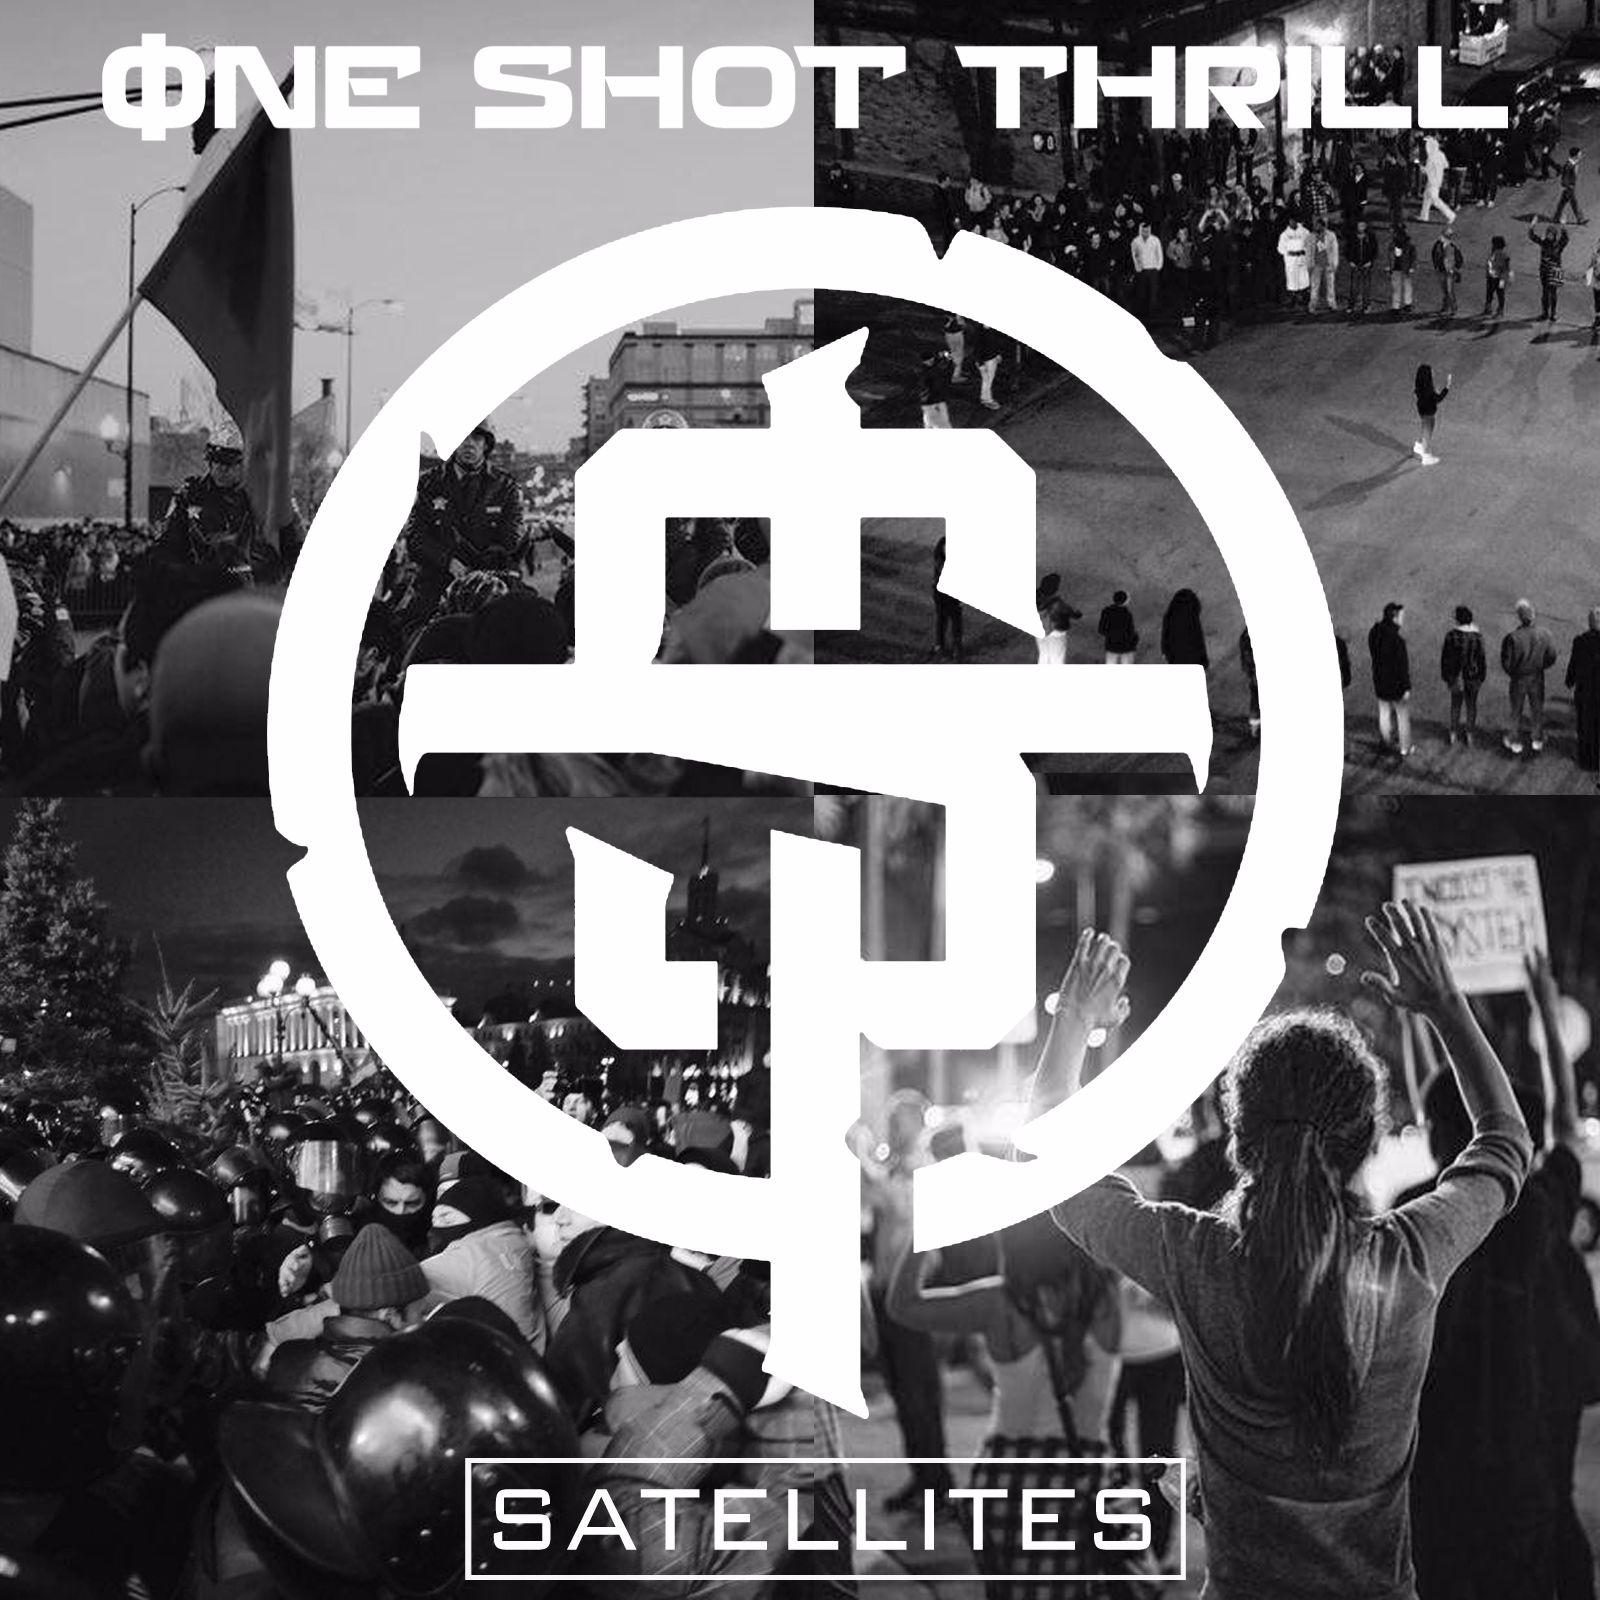 One Shot Thrill - Satellites [Single] (2016)